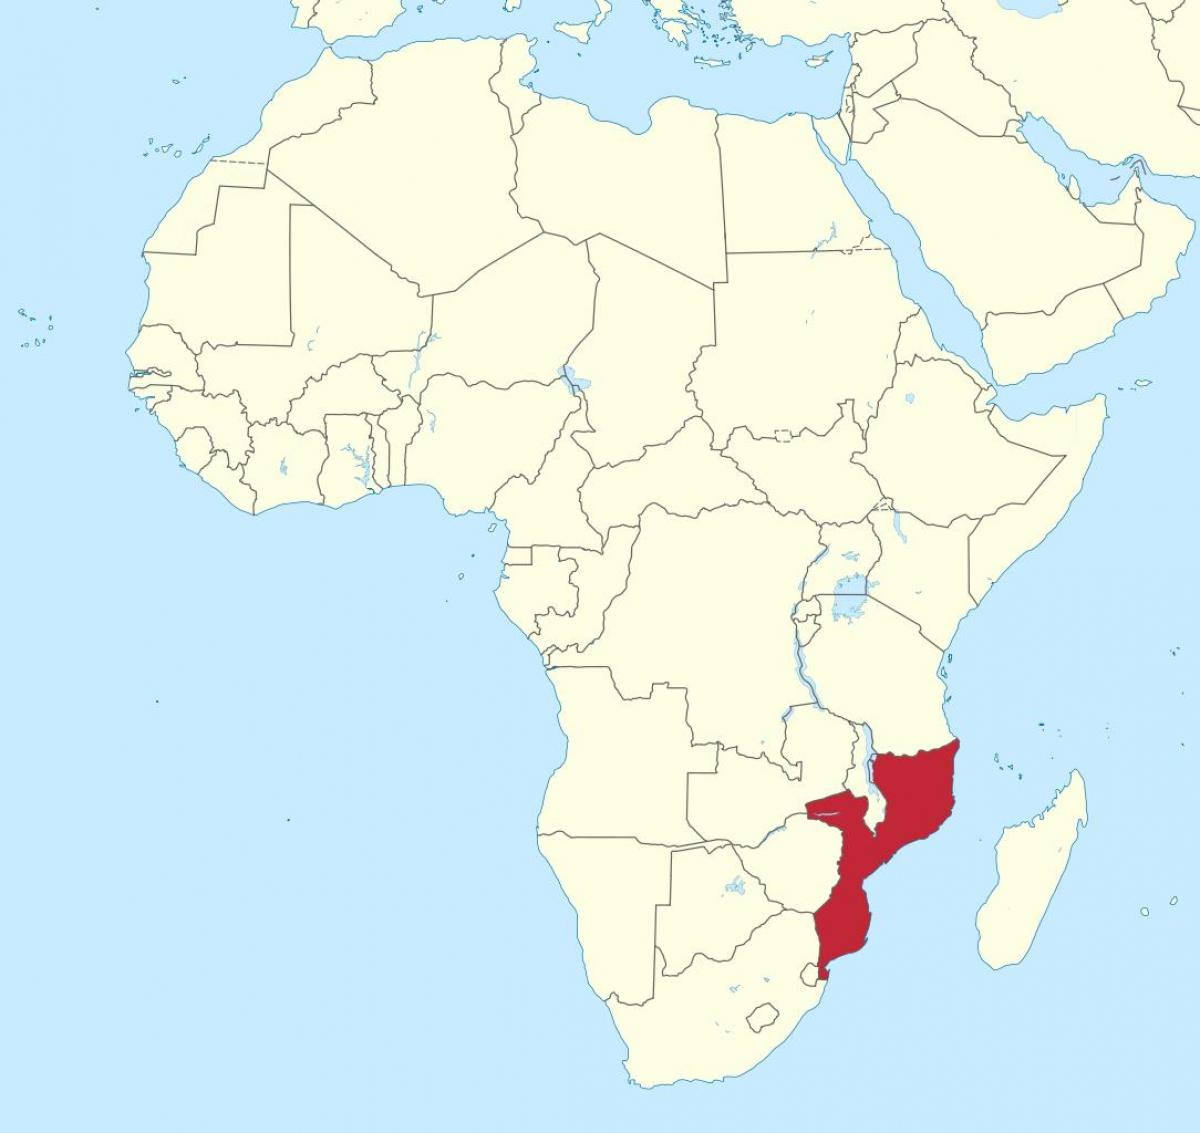 Mozambique I Afrika Kort Kort Over Mozambique I Afrika Ostlige